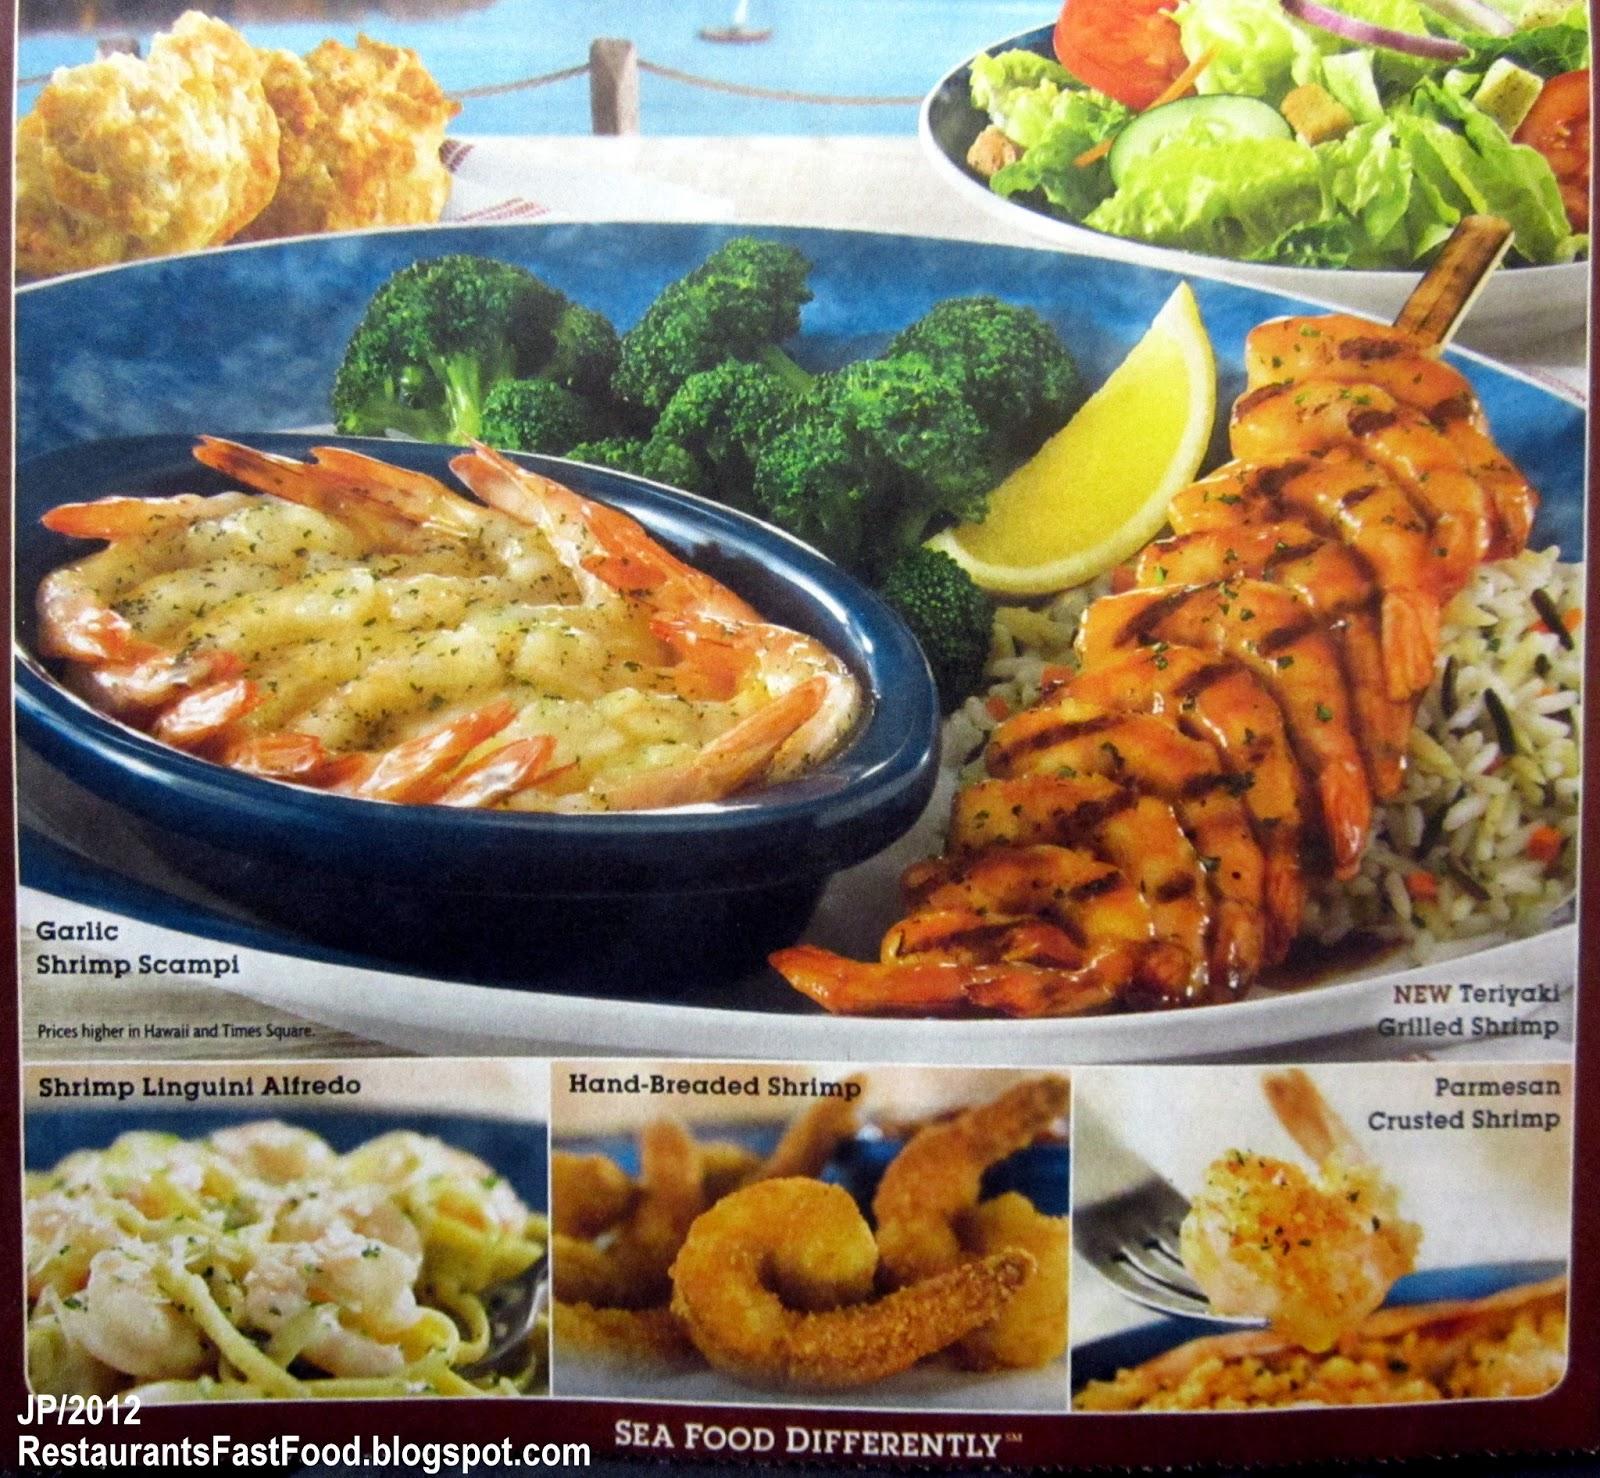 Red Lobster Seafood Restaurant Endless Shrimp Promotion All You Can Eat Fried Teriyaki Scampi Parmesan